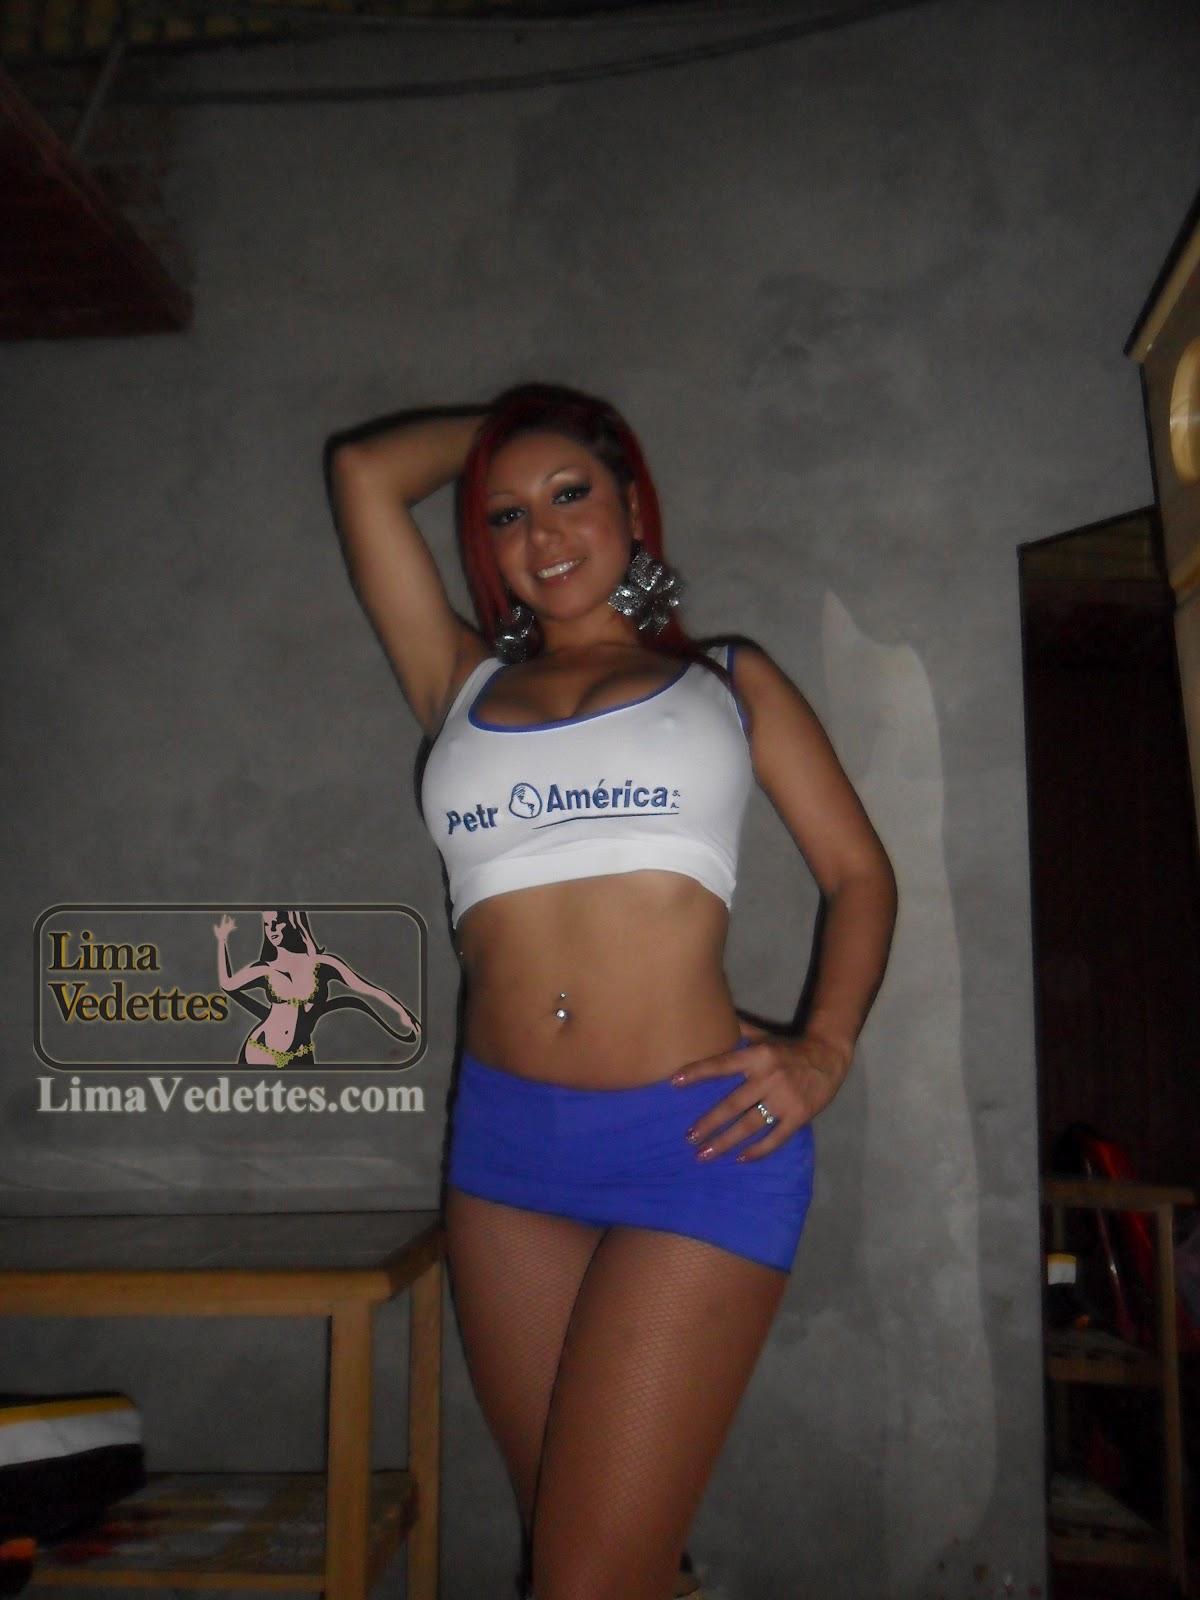 Daysi Araujo Latin Models Celeste Muriega Fotos Hot Falda